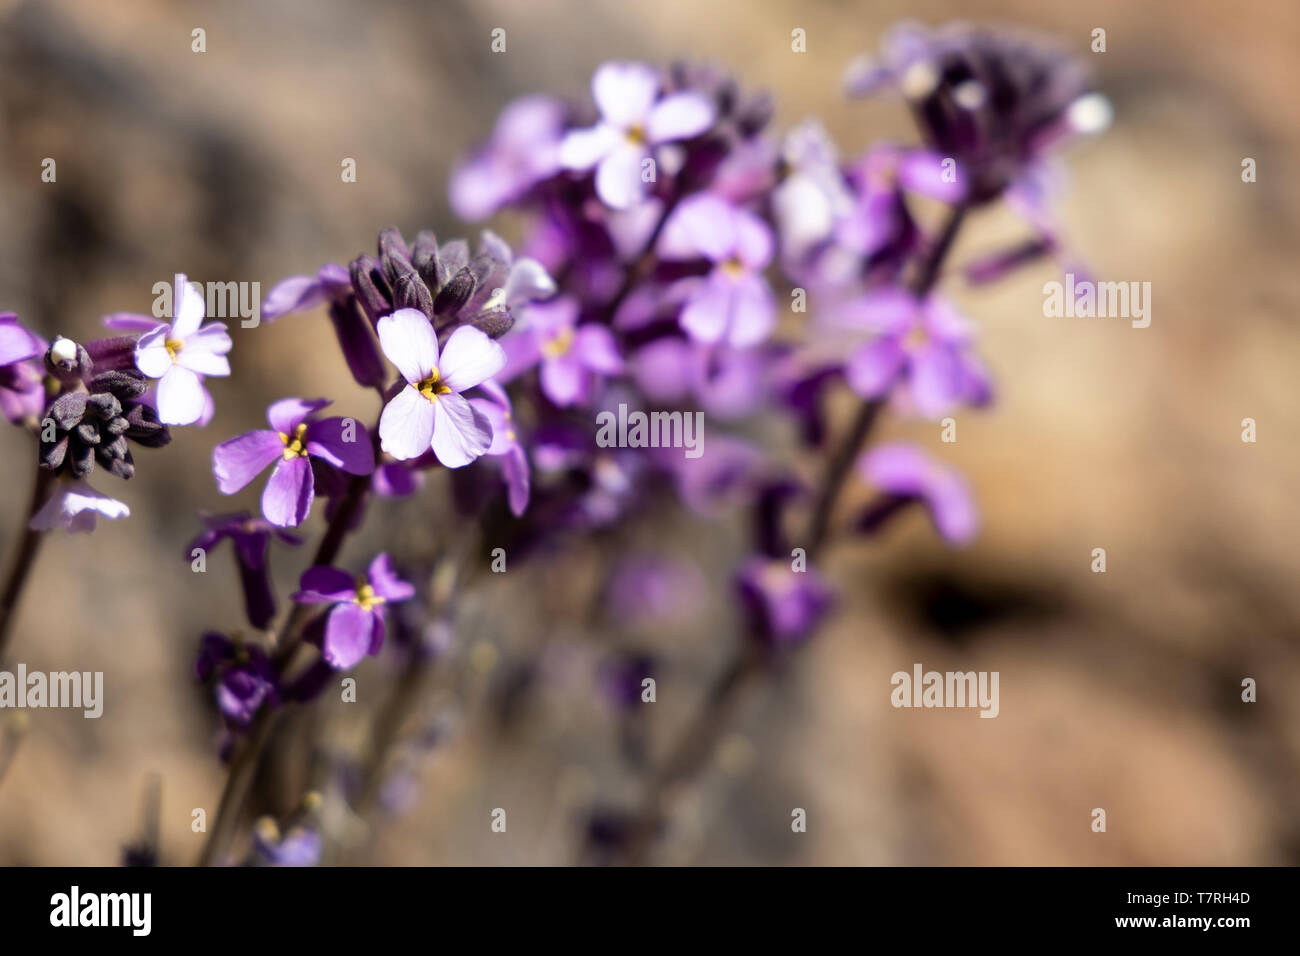 Erysimum scoparium, Alheli del Teide, Kanarische Mauerblümchen, Montaña Blanca, Las Cañadas del Teide, Teneriffa, Kanarische Inseln, Spanien Stockfoto